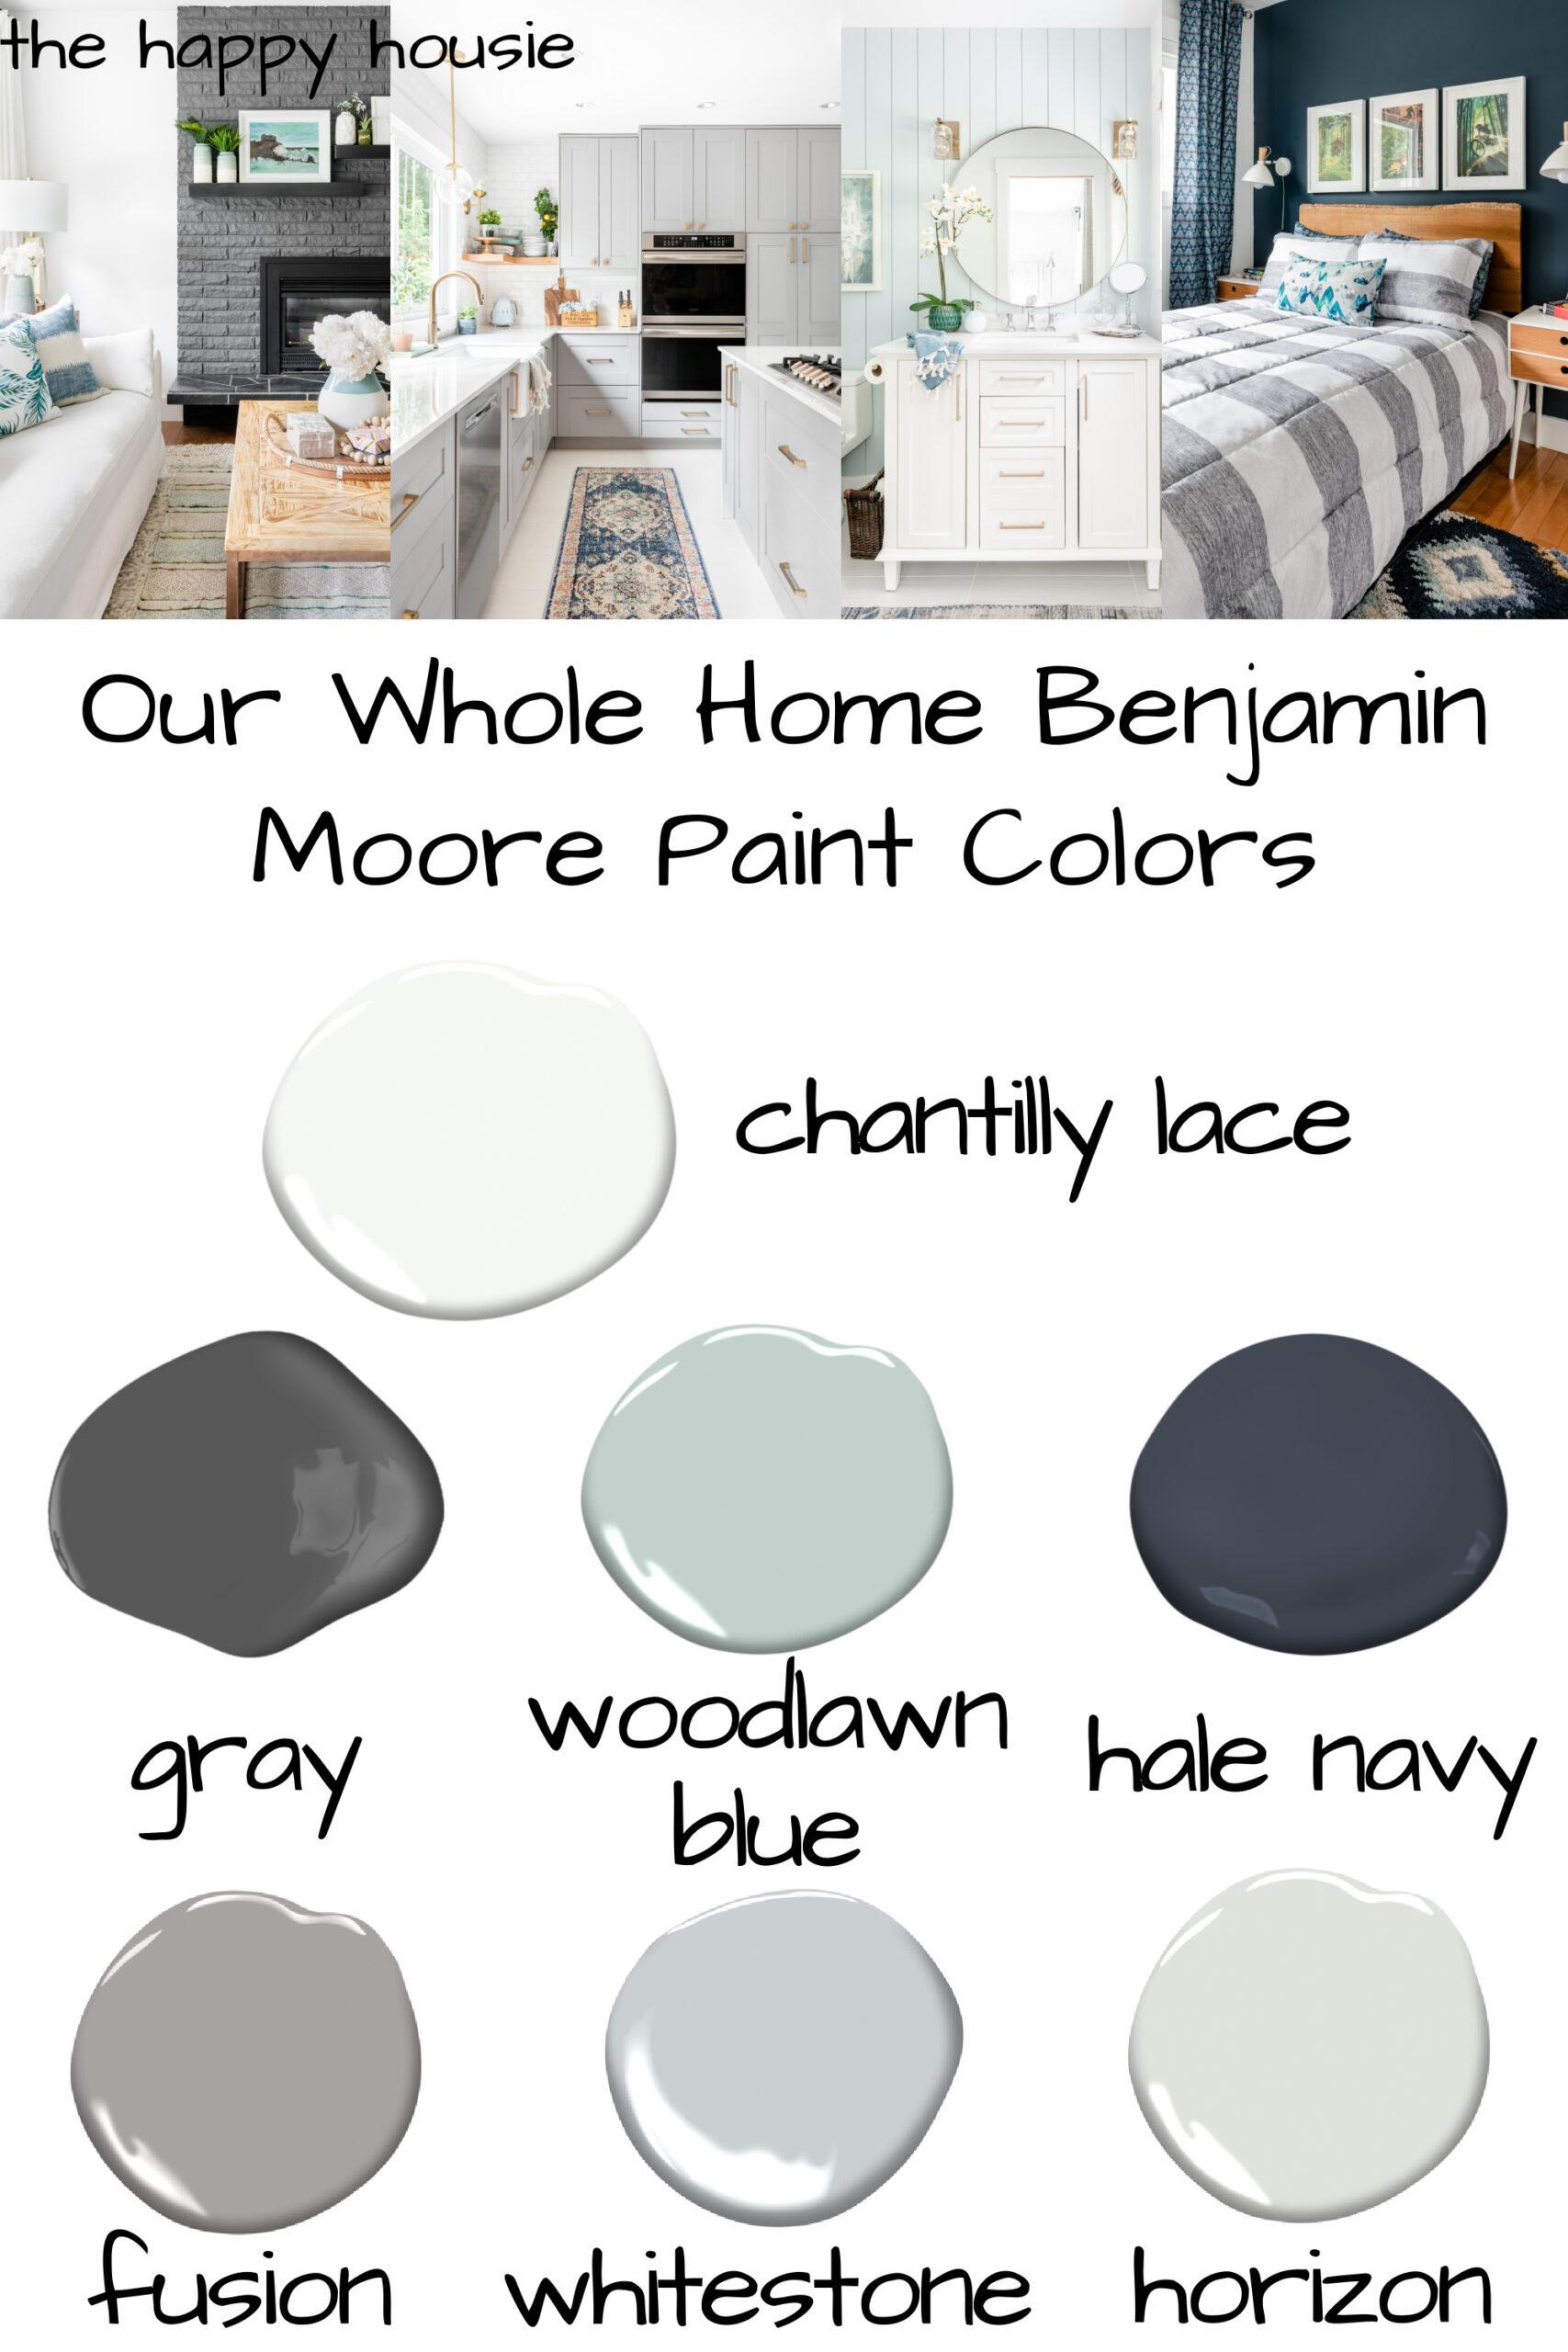 Whole Home Benjamin Moore Paint Color Scheme   The Happy Housie